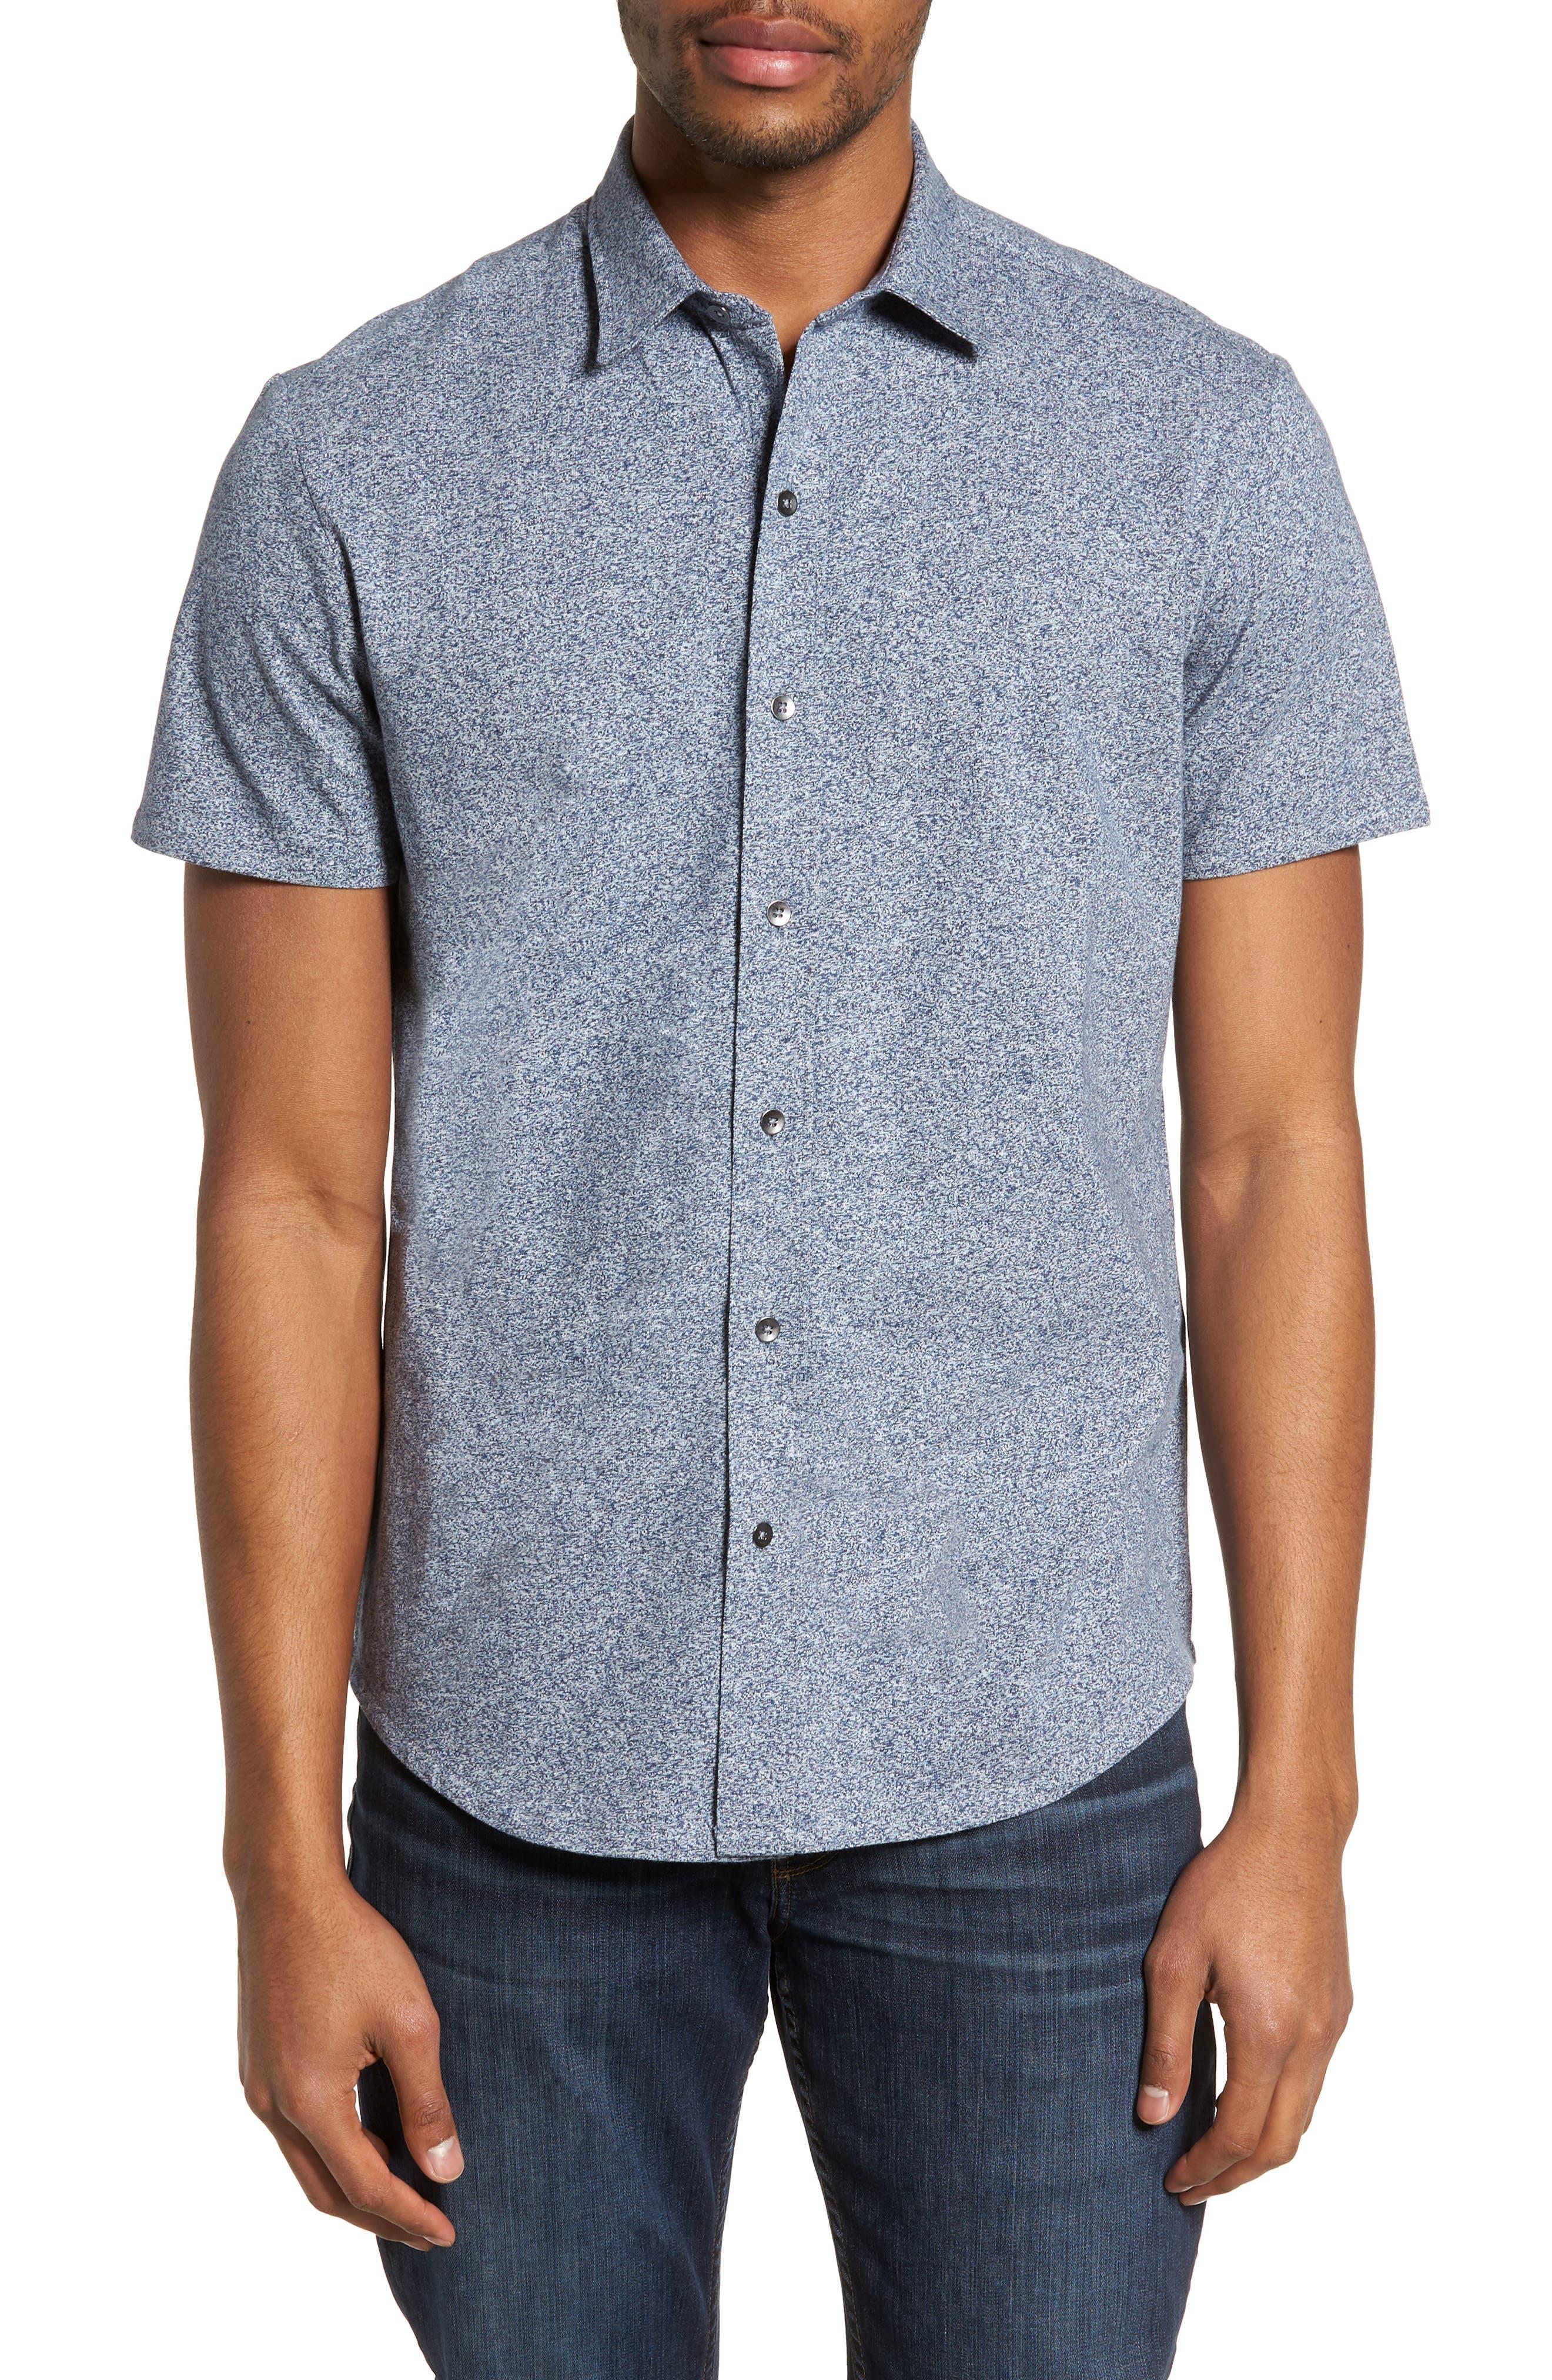 'Metropolitan' Knit Short Sleeve Sport Shirt,                             Main thumbnail 1, color,                             NAVY/ WHITE